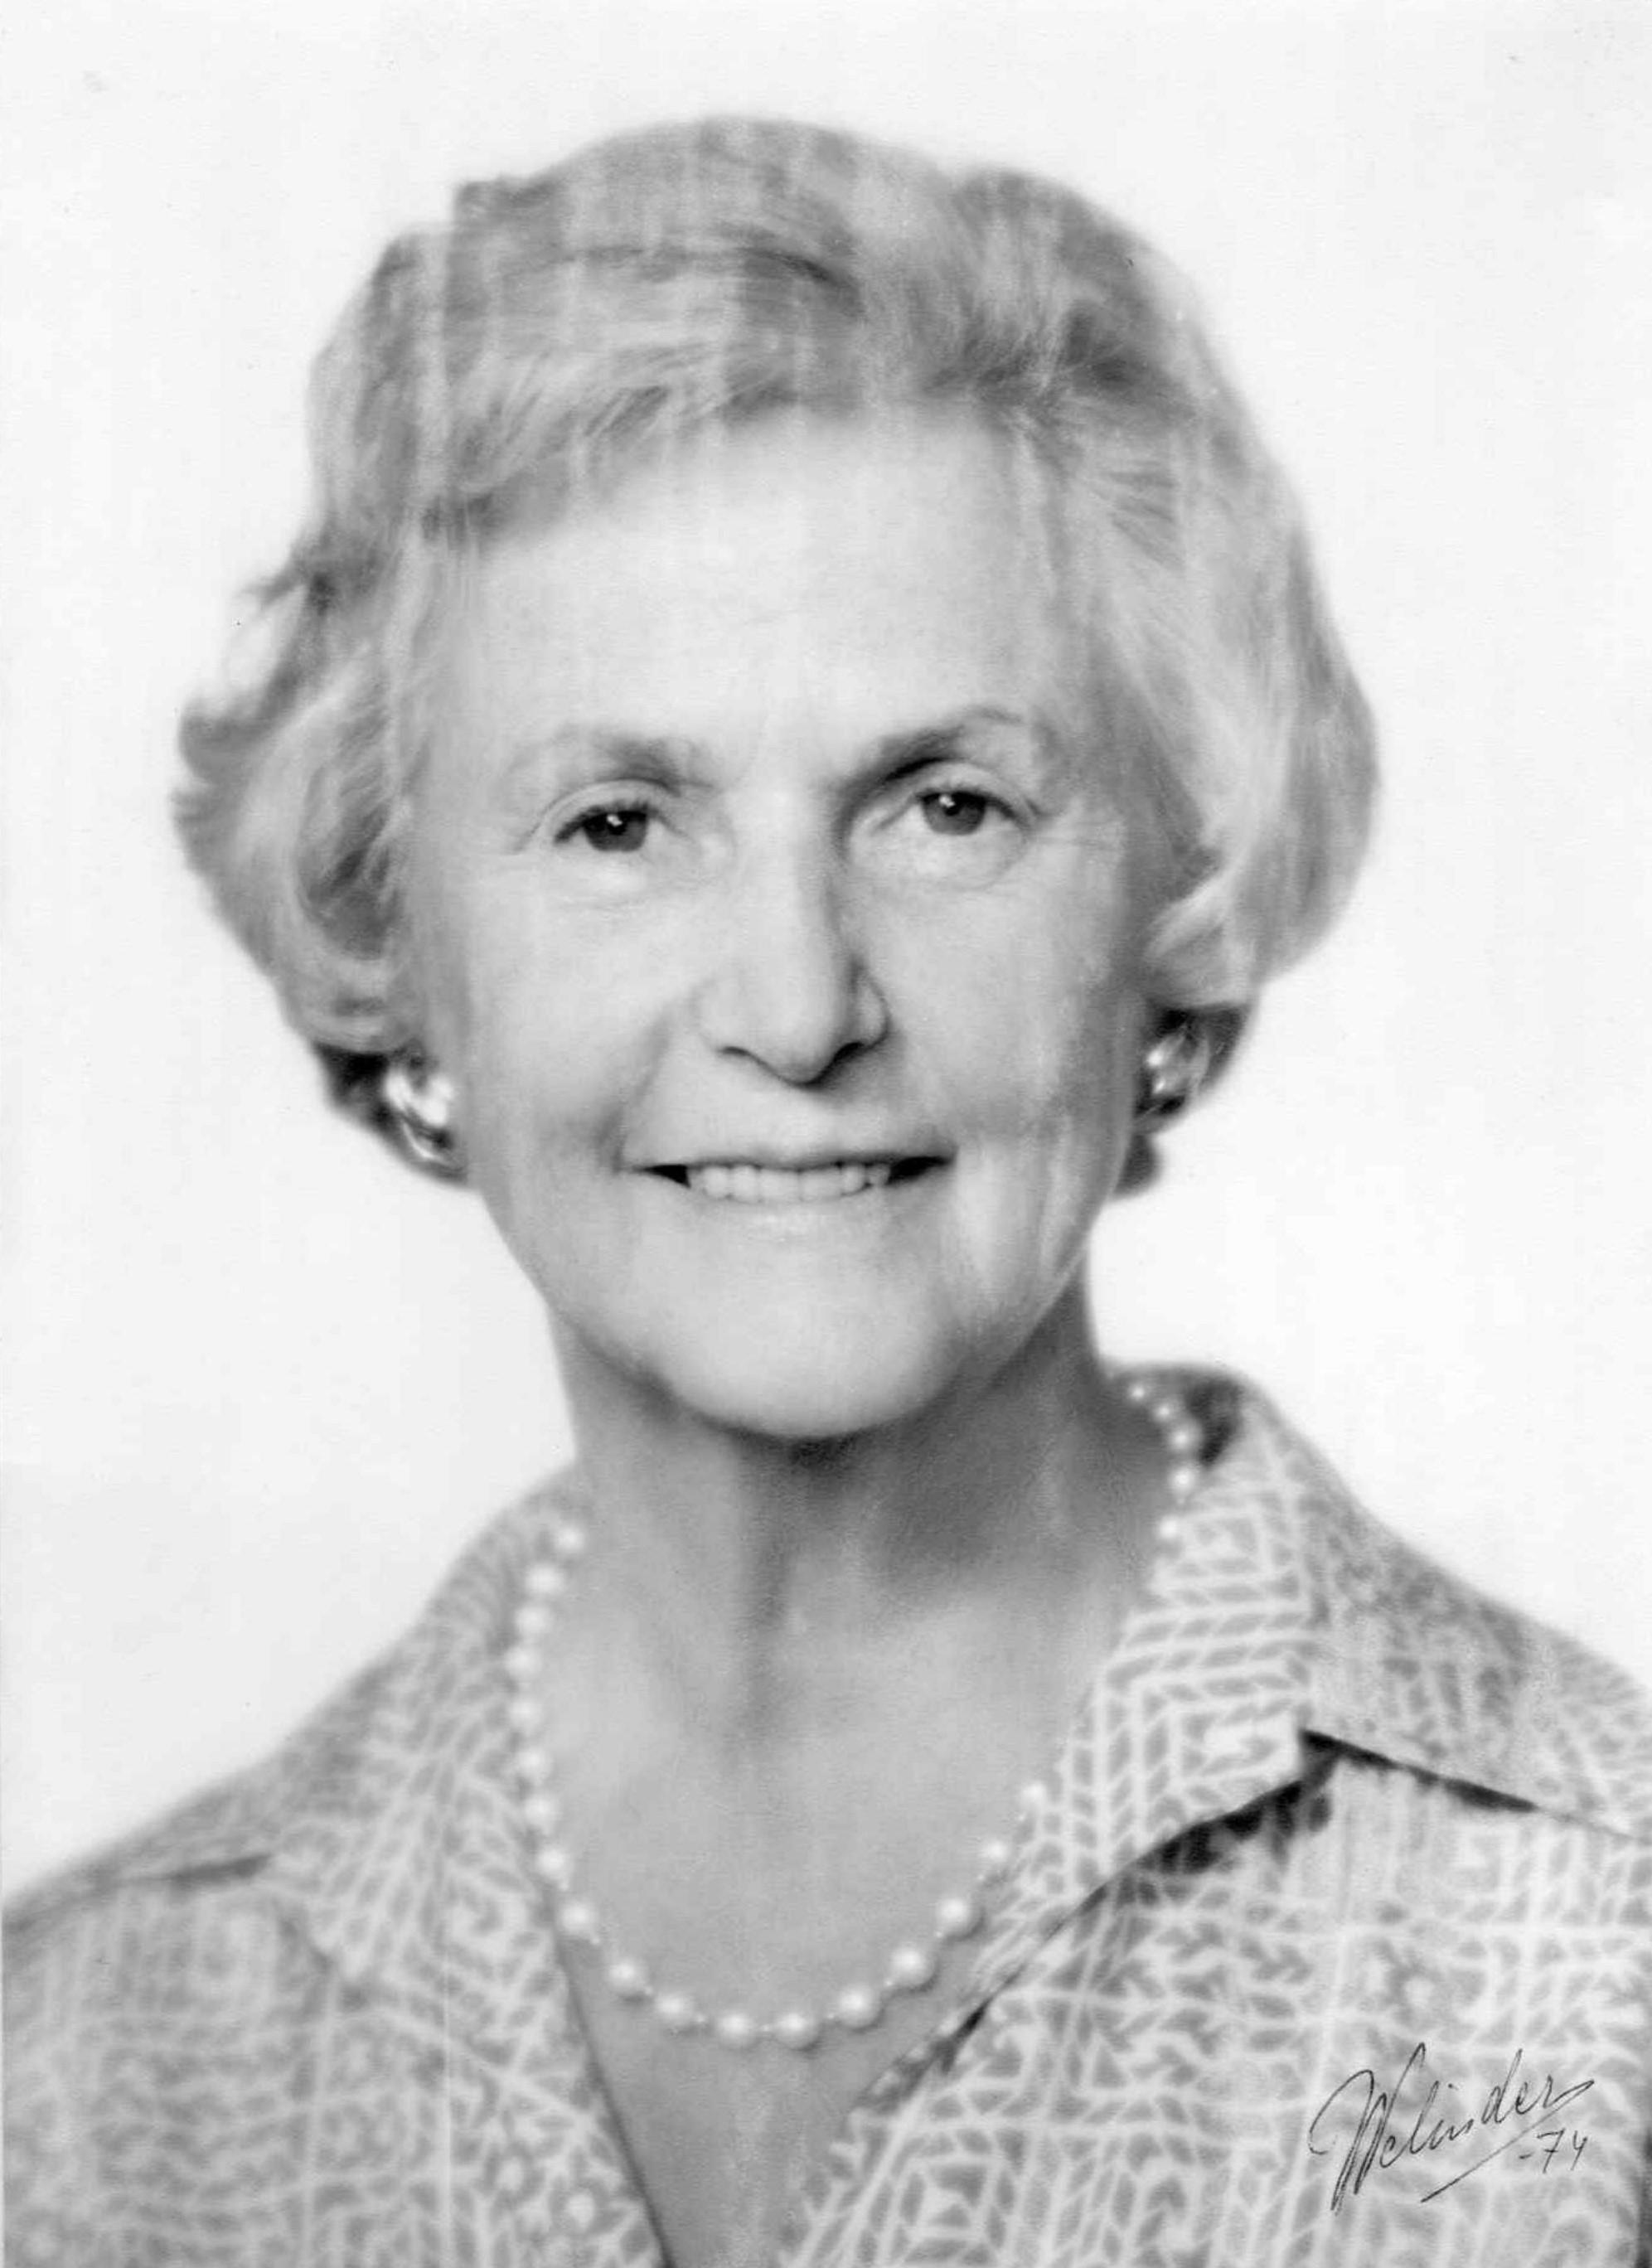 Margaretha von Schwerin, 1974. Photographer unknown (signed Welinder). Privately owned image